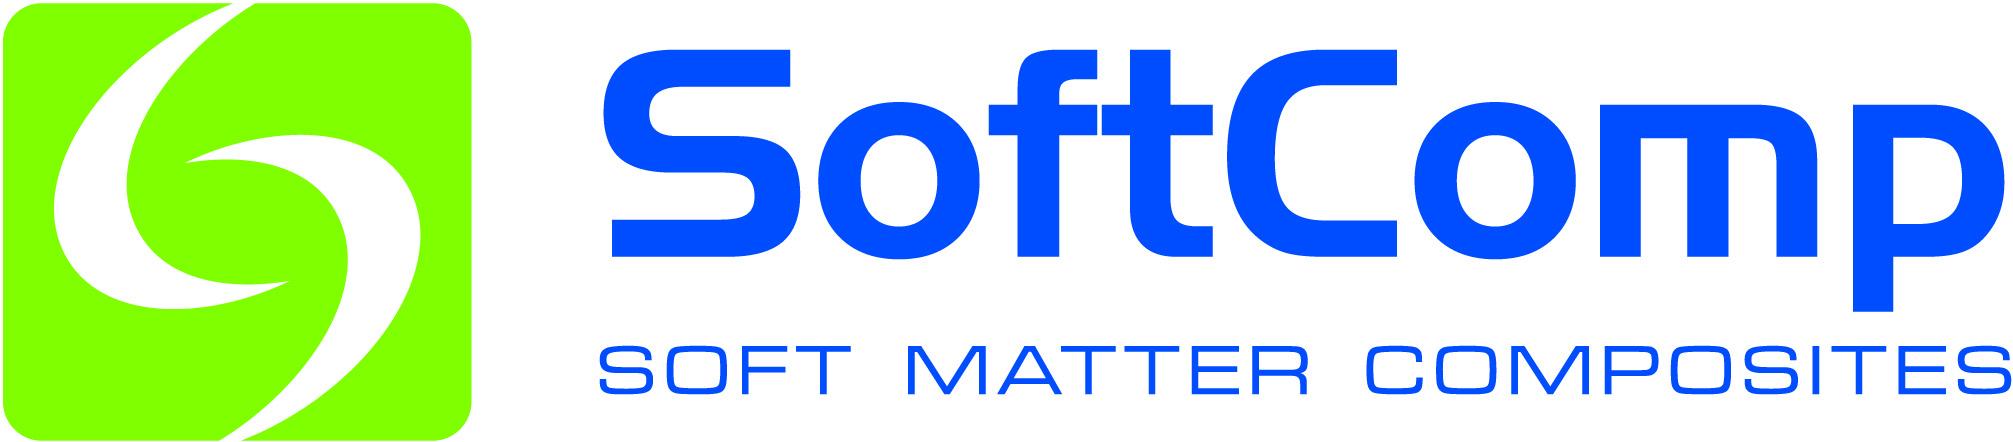 SoftComp logo, 2013 x 442 pixels, jpg, 711 KB